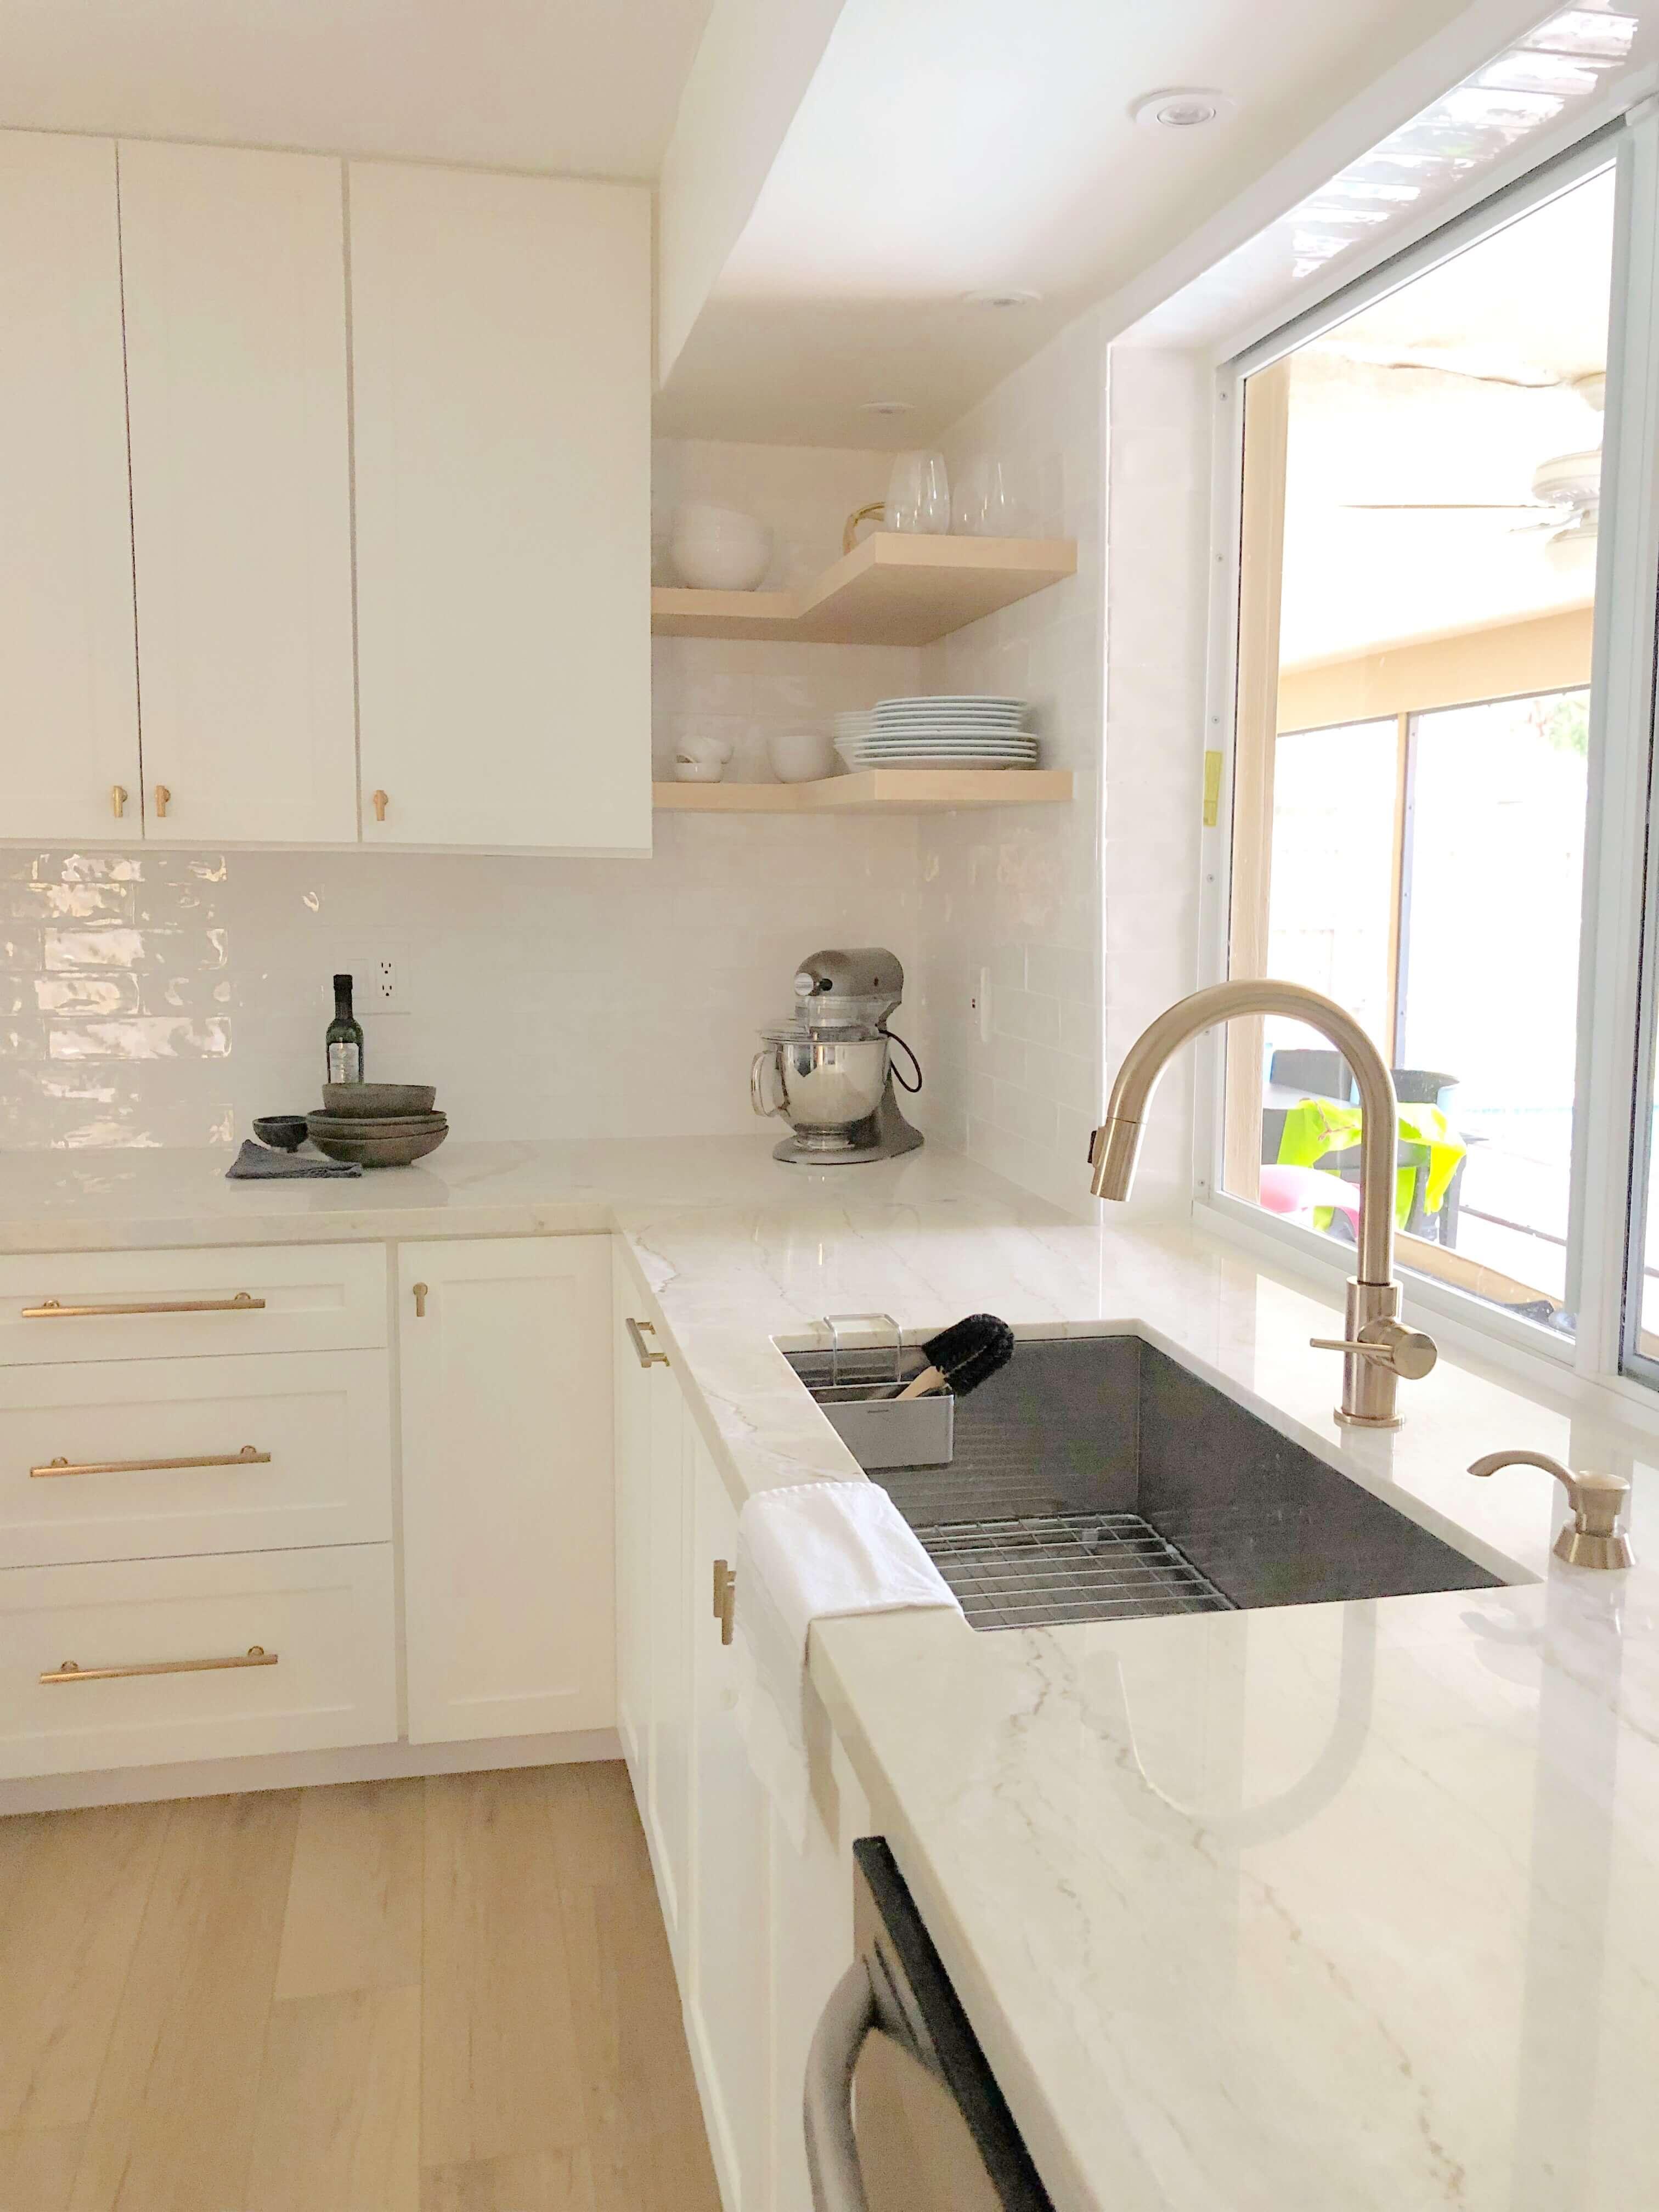 kitchen renovation comapany in Plantation, FL